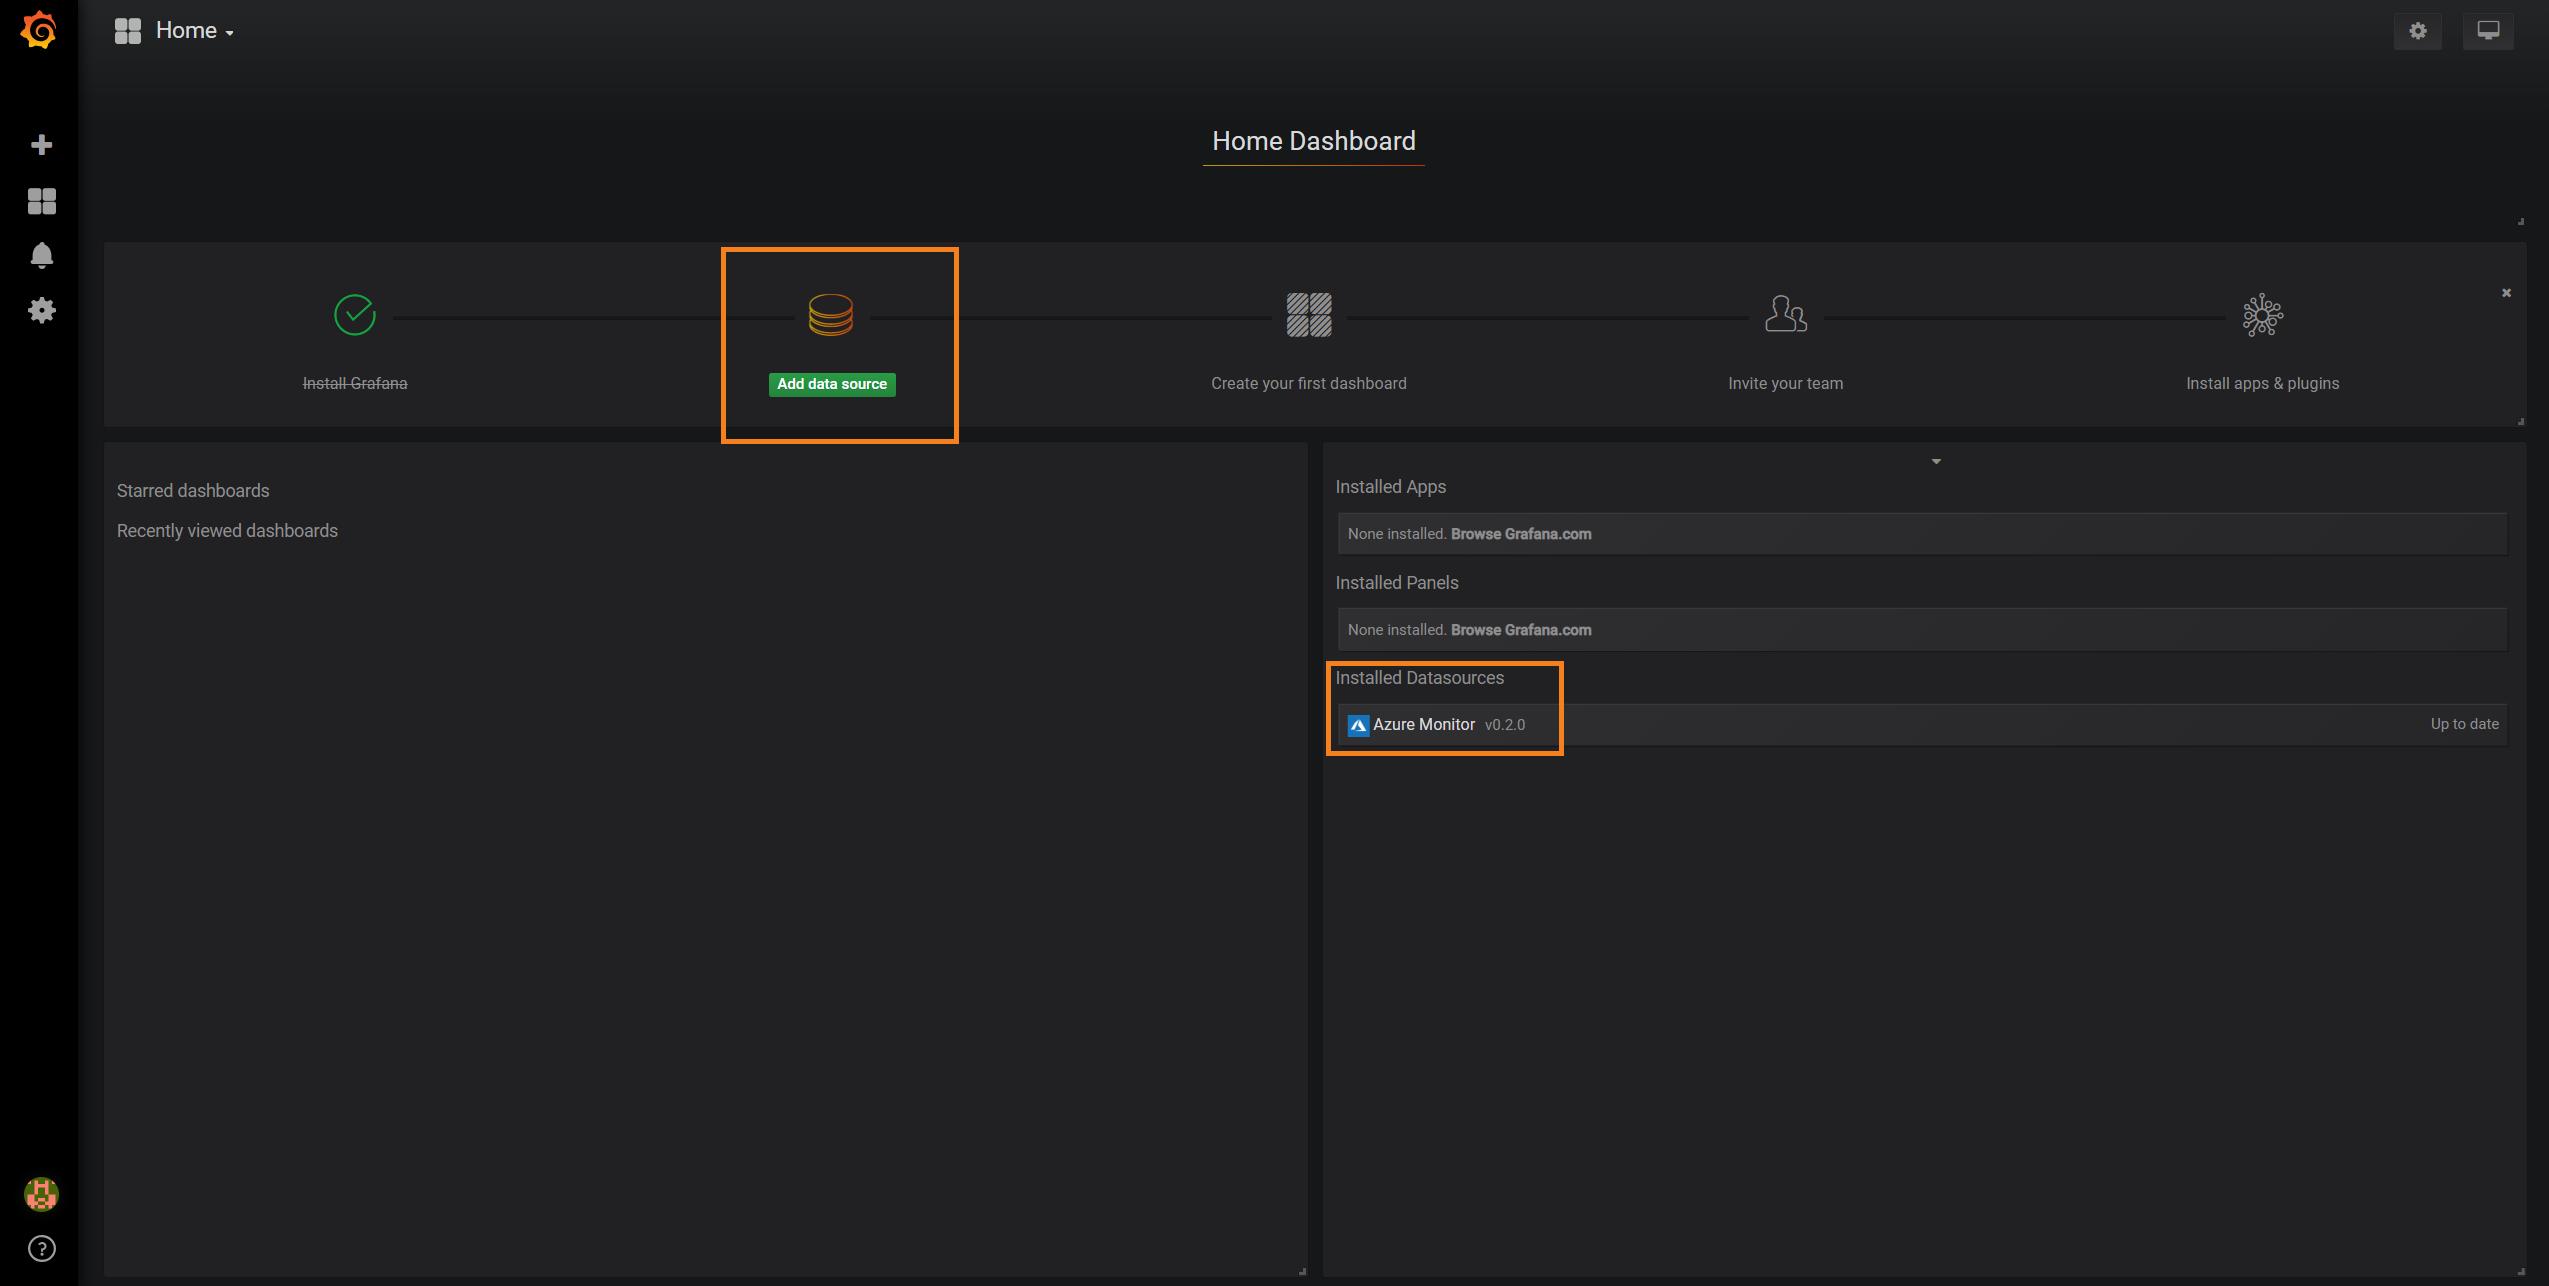 Monitor Azure services and applications using Grafana | Microsoft Docs